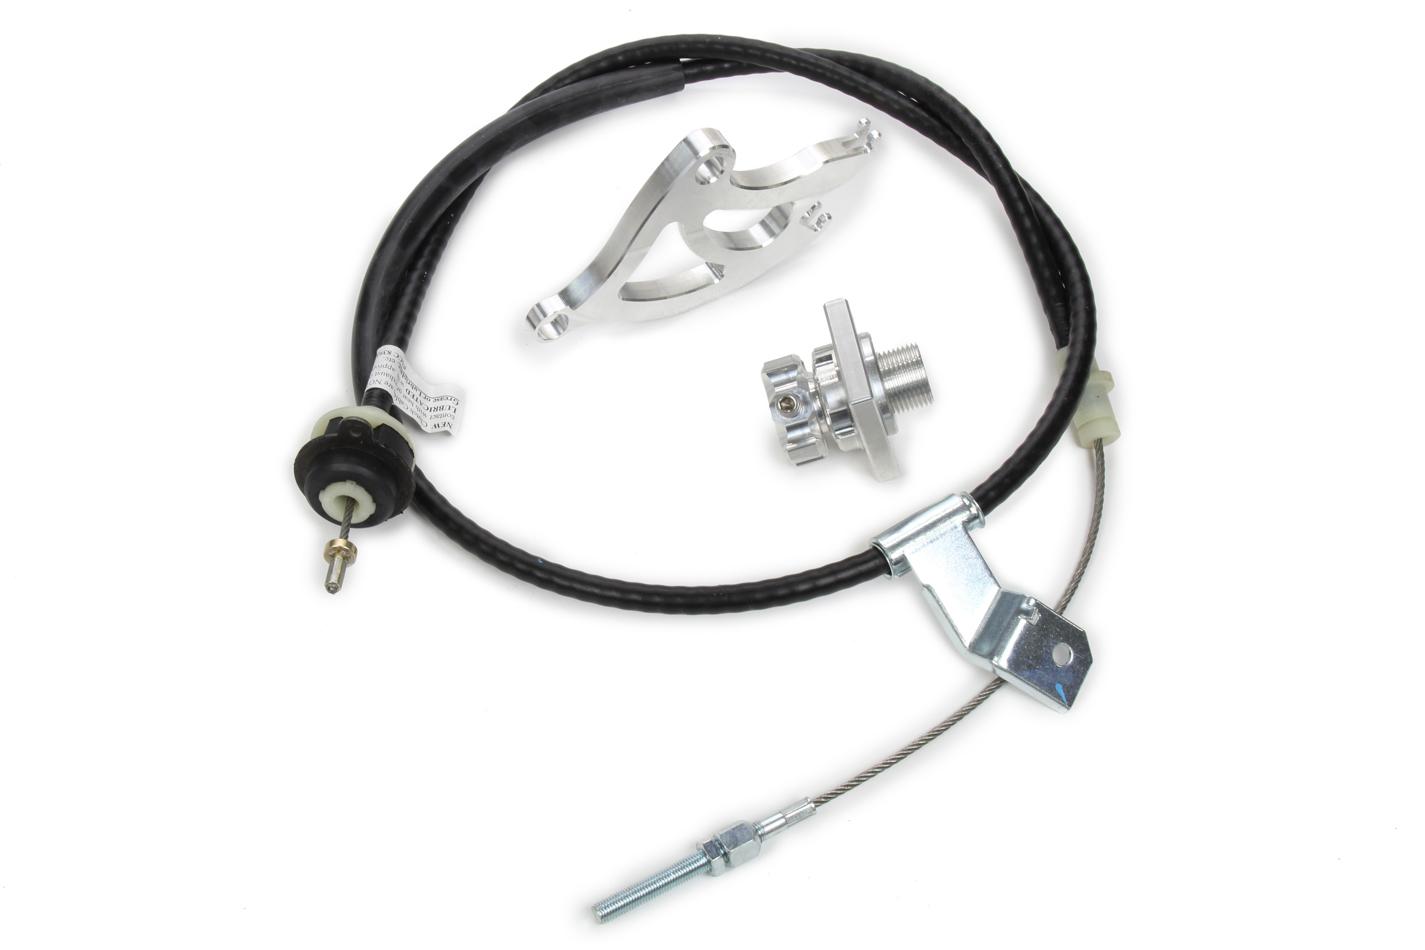 Ram Clutch Adj Clutch Cable Kit Mustang 5.0L 1979-95